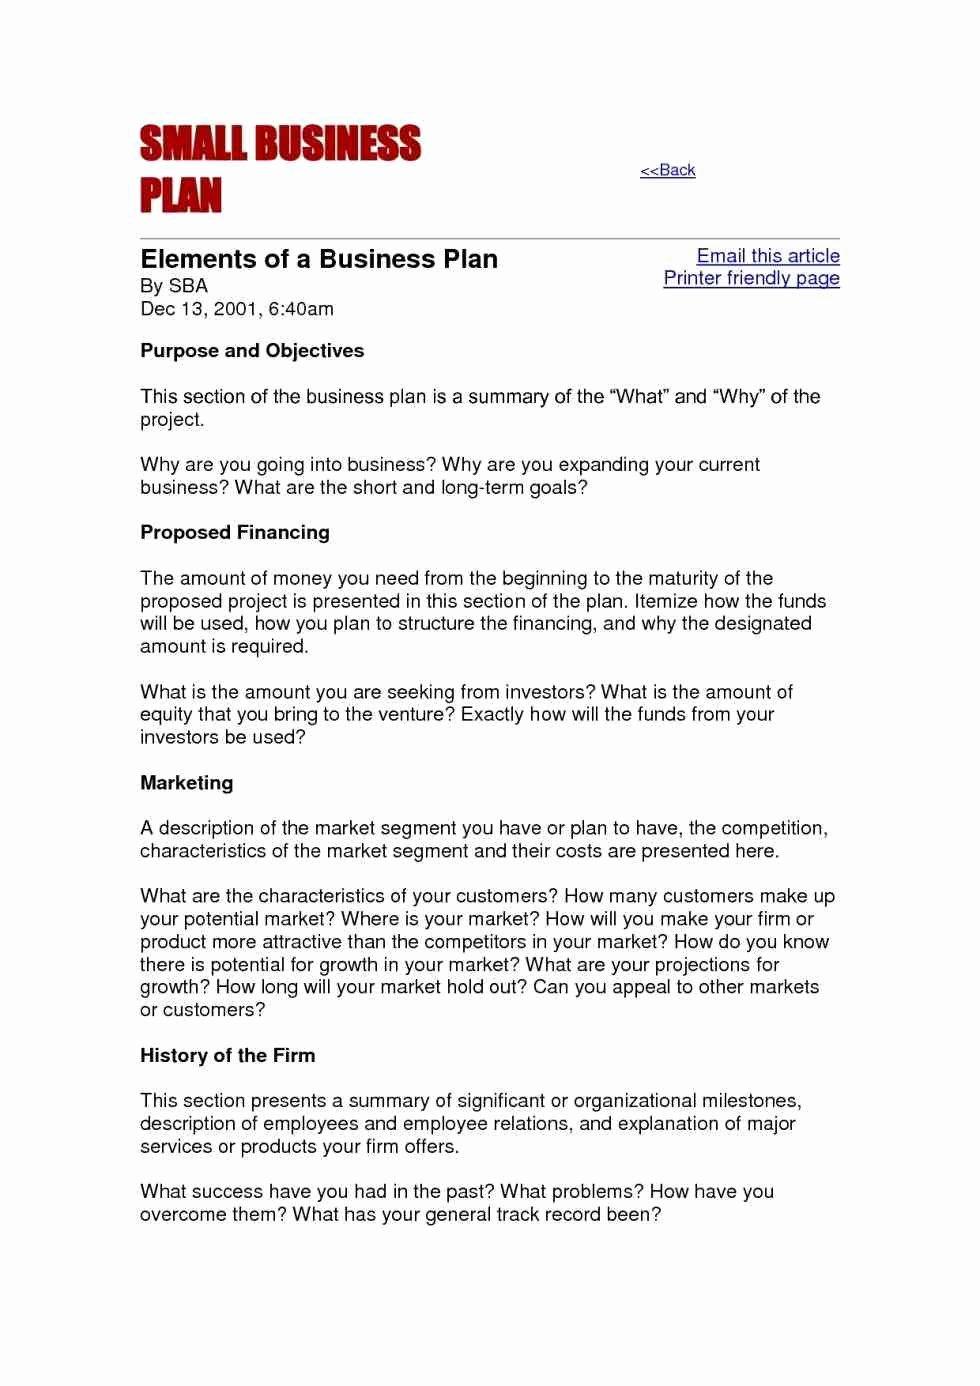 Business Partnership Proposal Sample Best Of 12 13 Sample Grant Proposal for Small Business